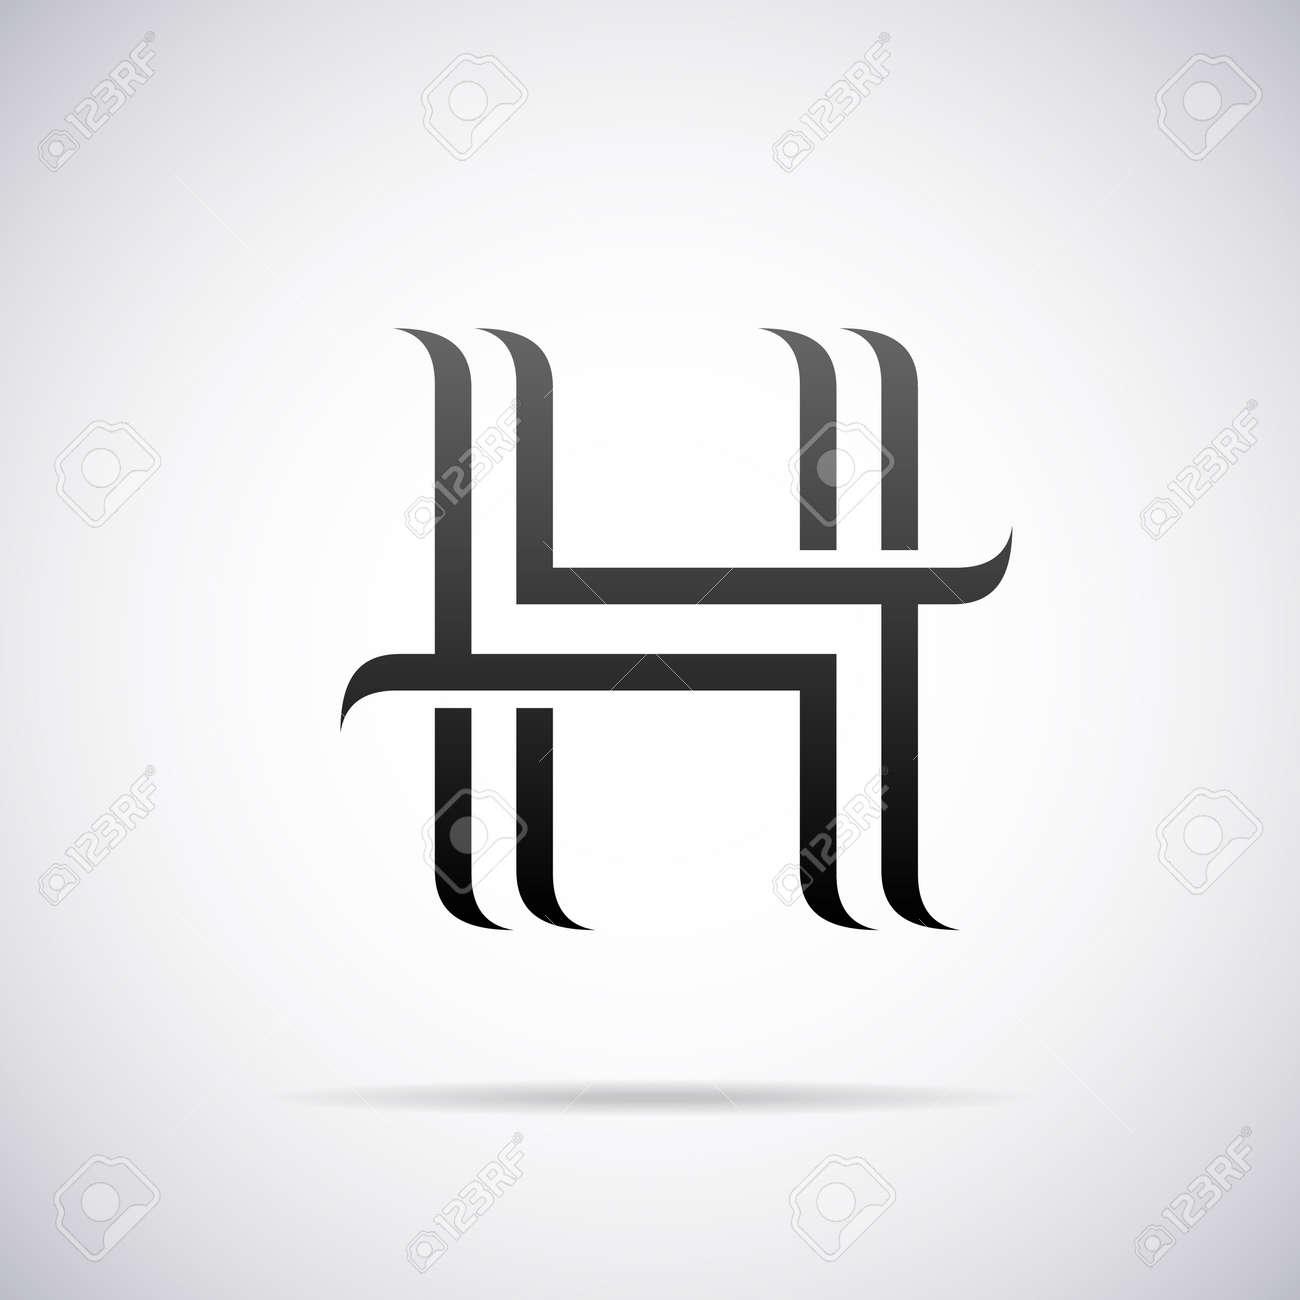 Logo For Letter H Design Template Vector Illustration